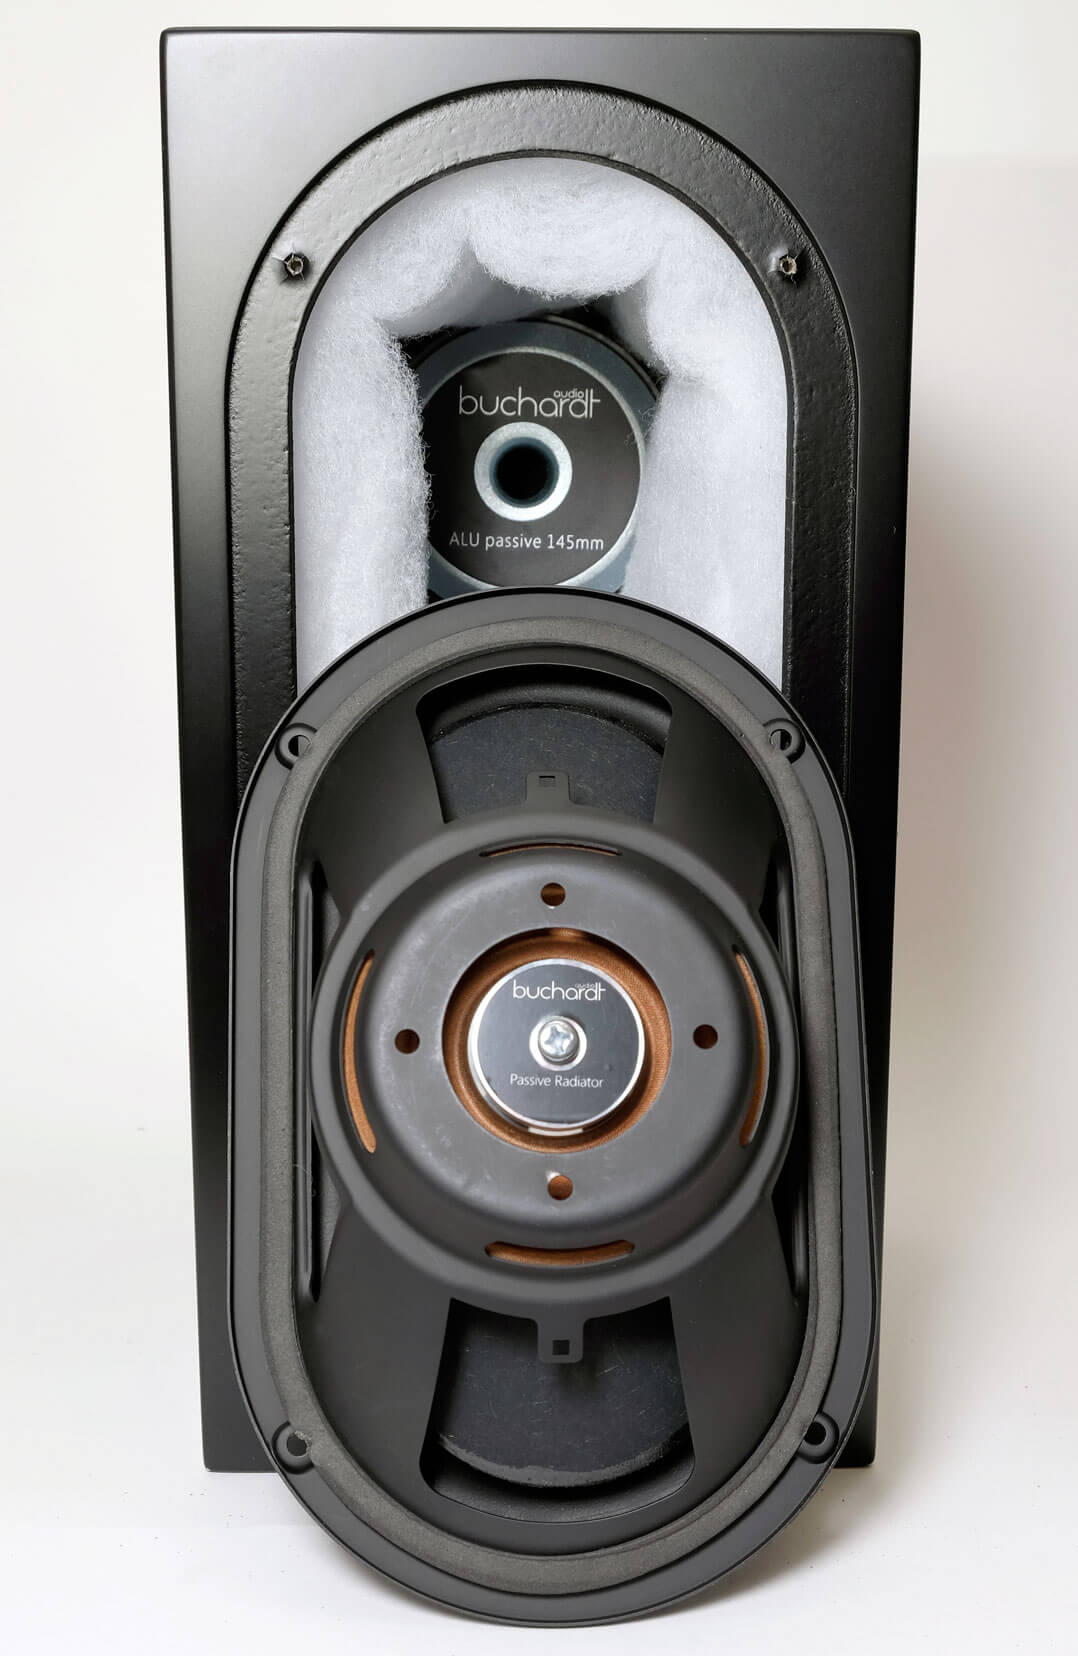 Buchardt Audio S400 rückwärtiger Treiber ausgebaut